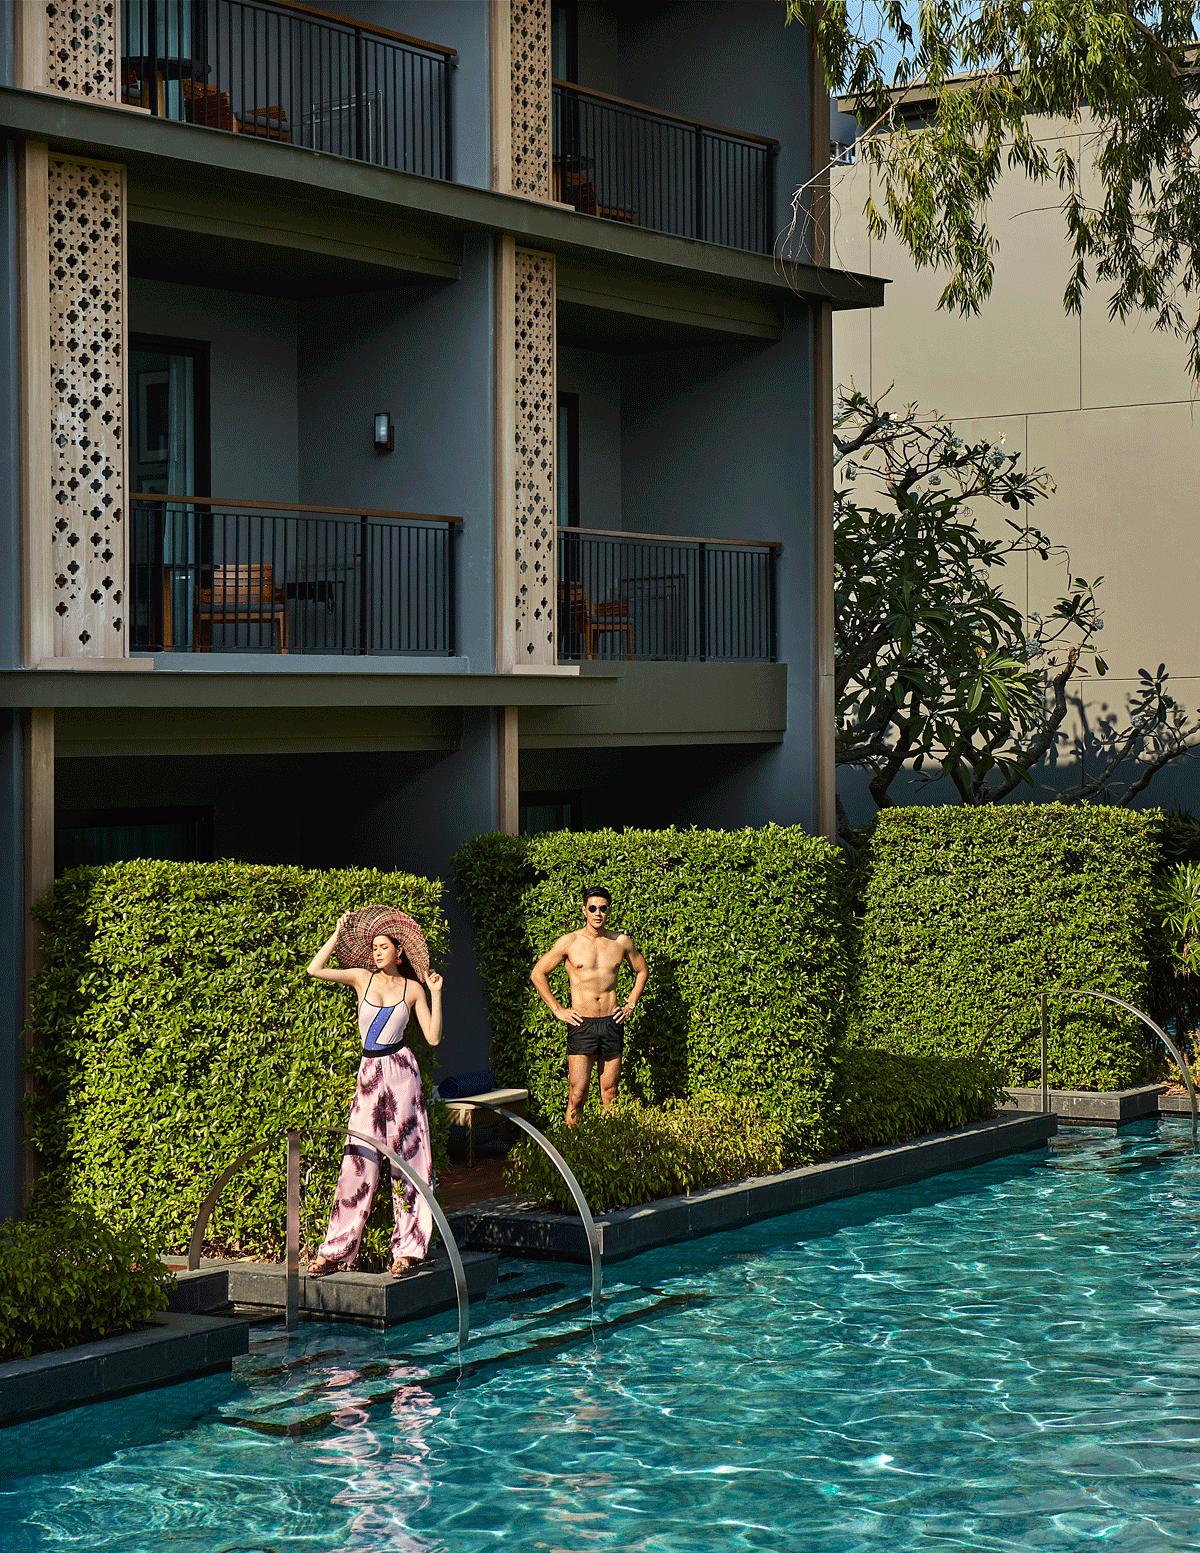 Mungkorn : shorts : SARIT / sunglasses : TAVAT  Nachad : swimwear : La La Love / pants : Calvin Klein Platinum / shoes : Christian Louboutin